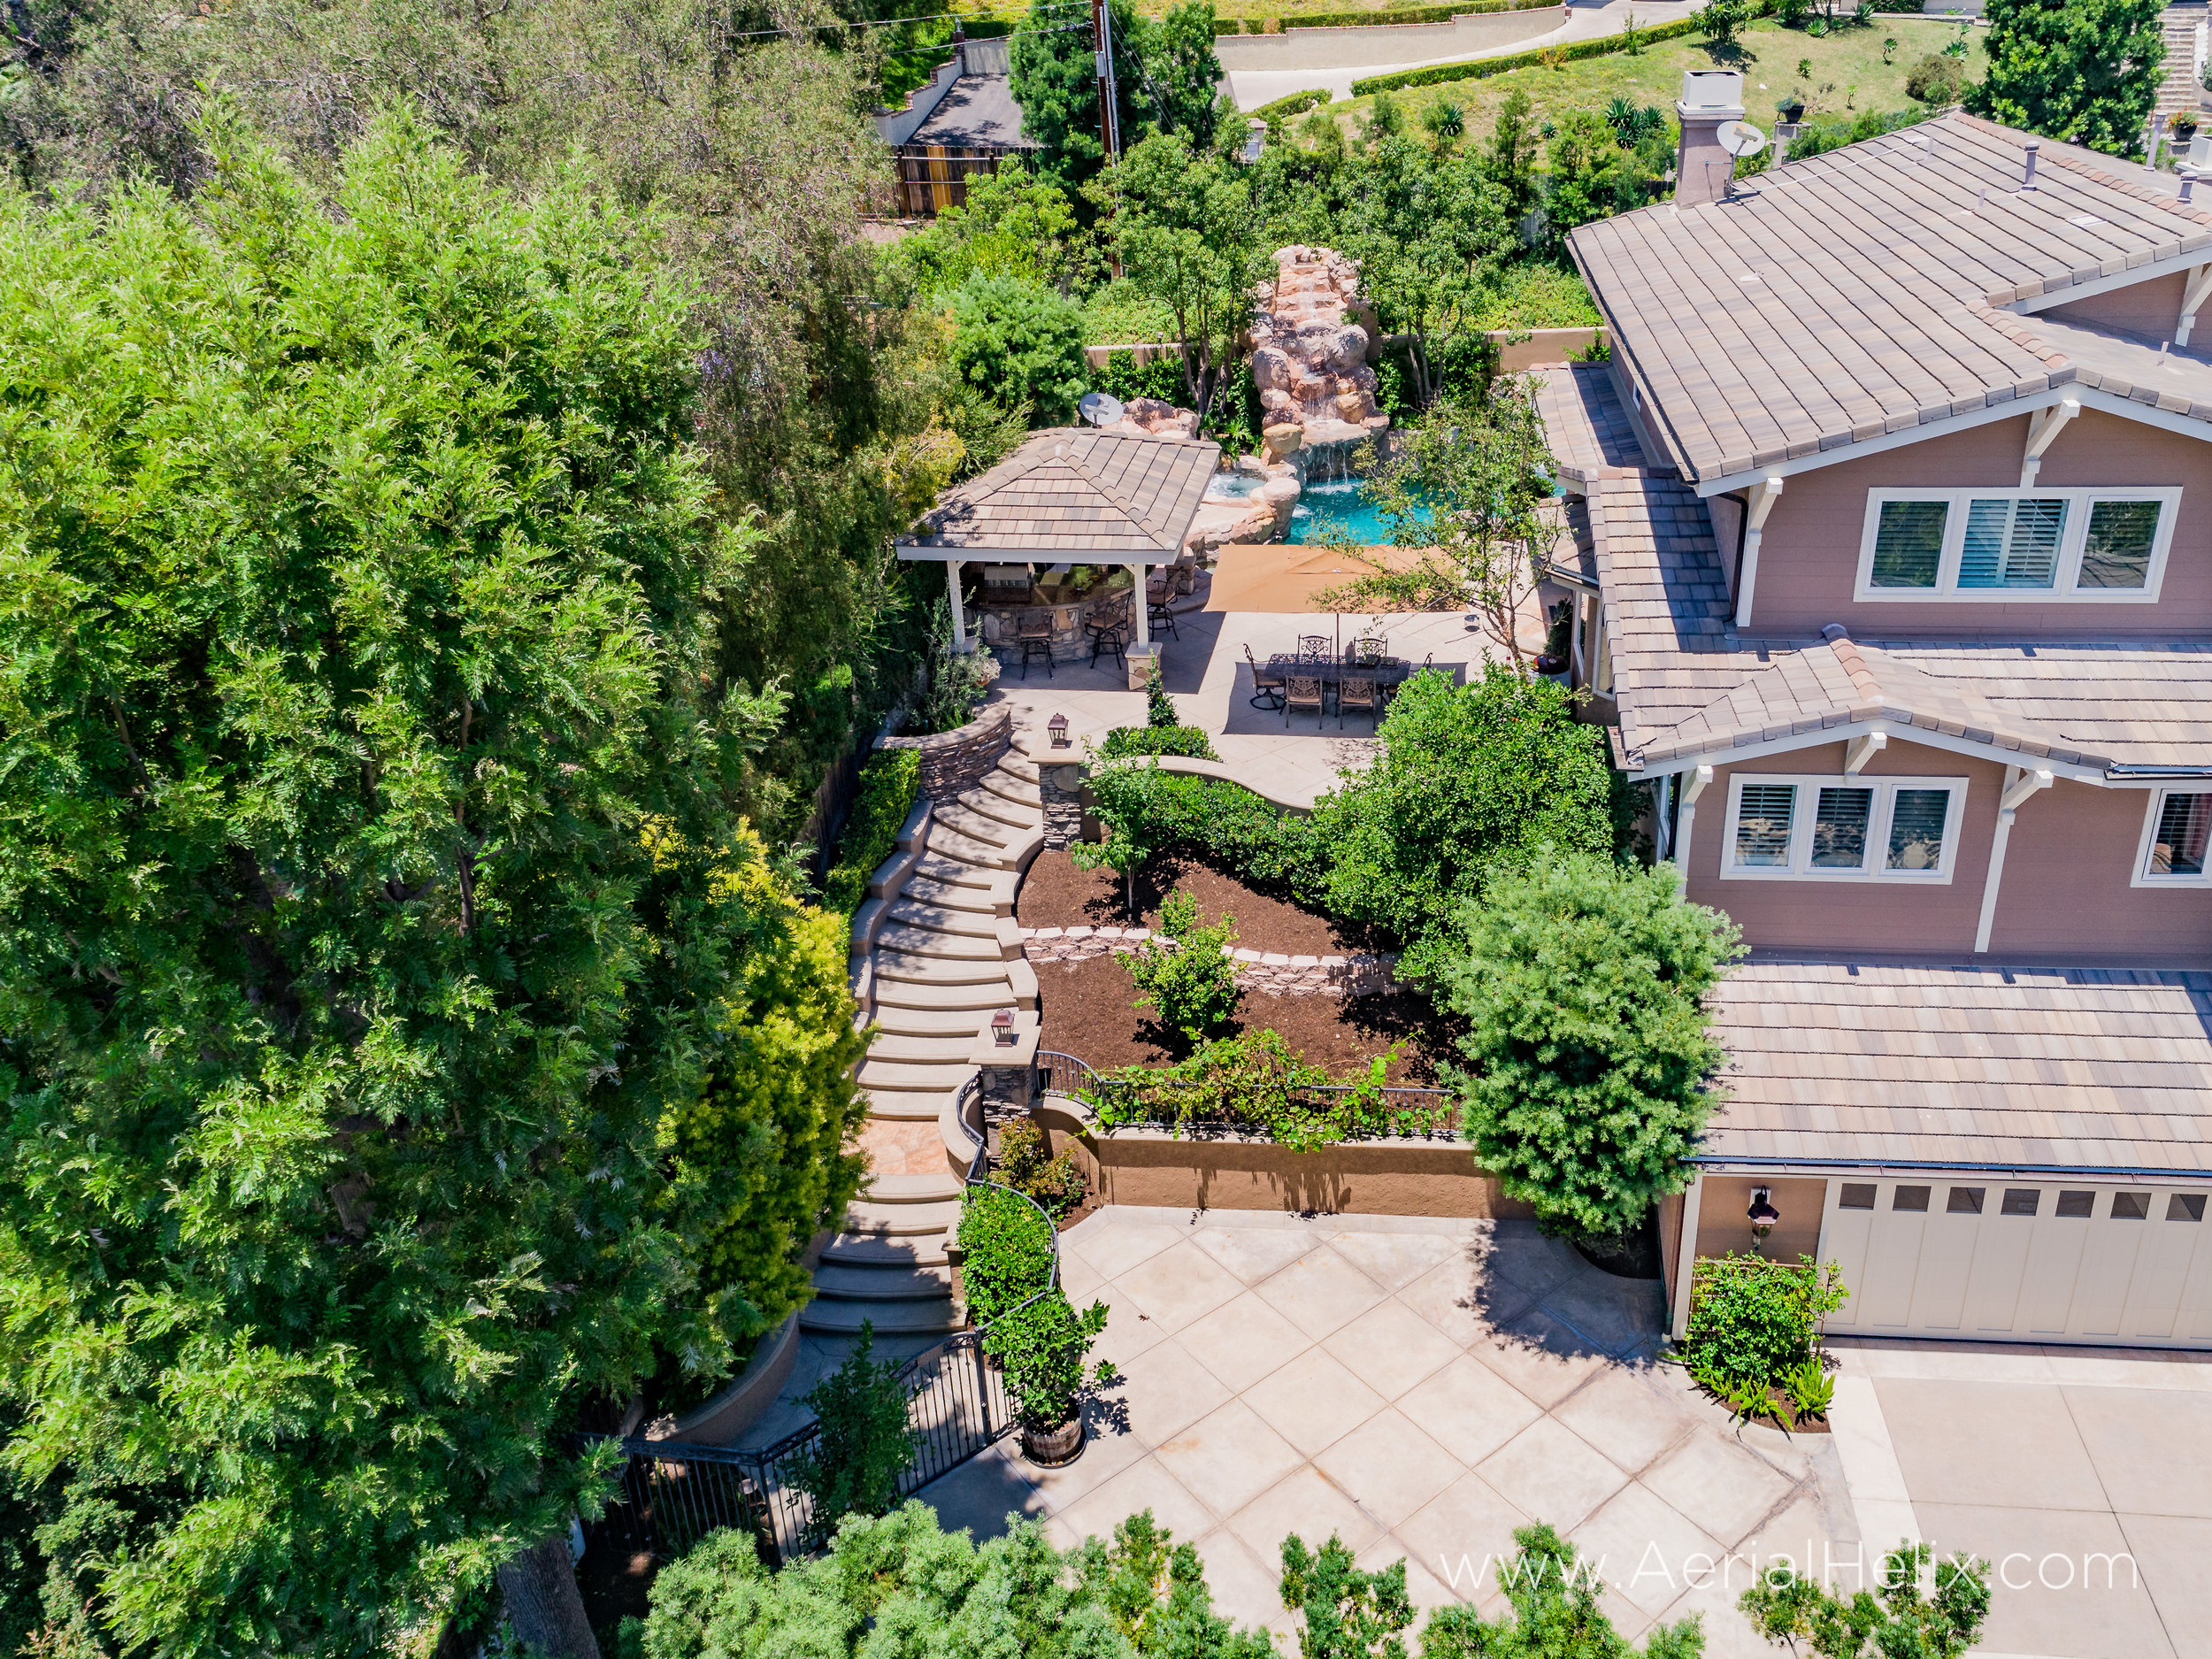 HELIX - Craftsman Lane - Real Estate Drone Photographer-9.jpg